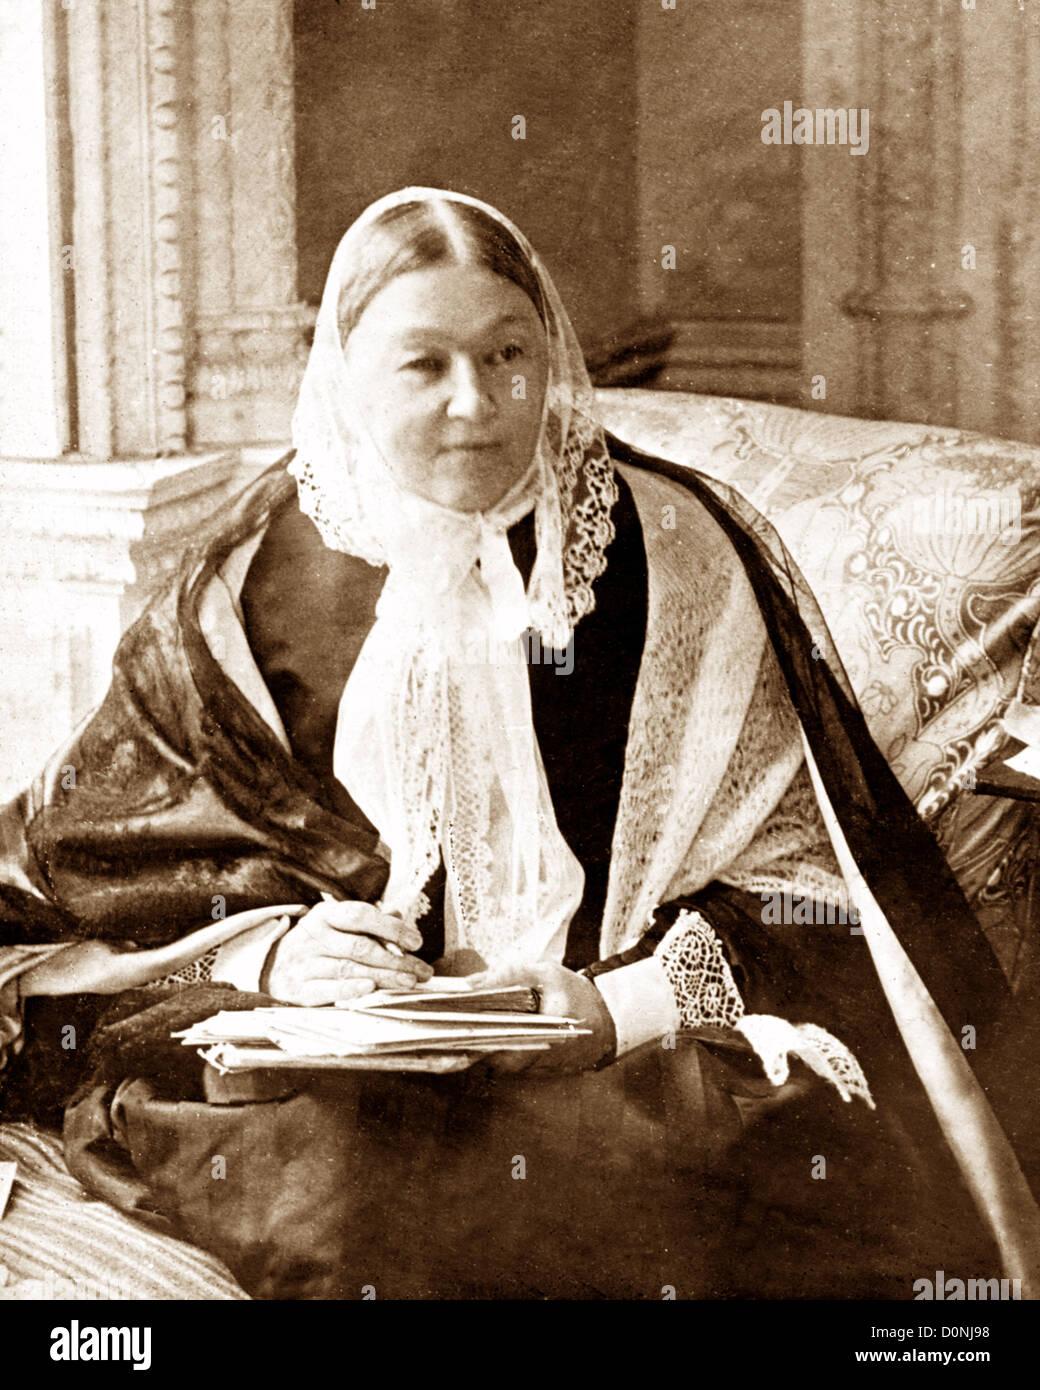 7aec18c46bc Florence Nightingale Victorian Heroine Nurse Stock Photo: 52106468 ...